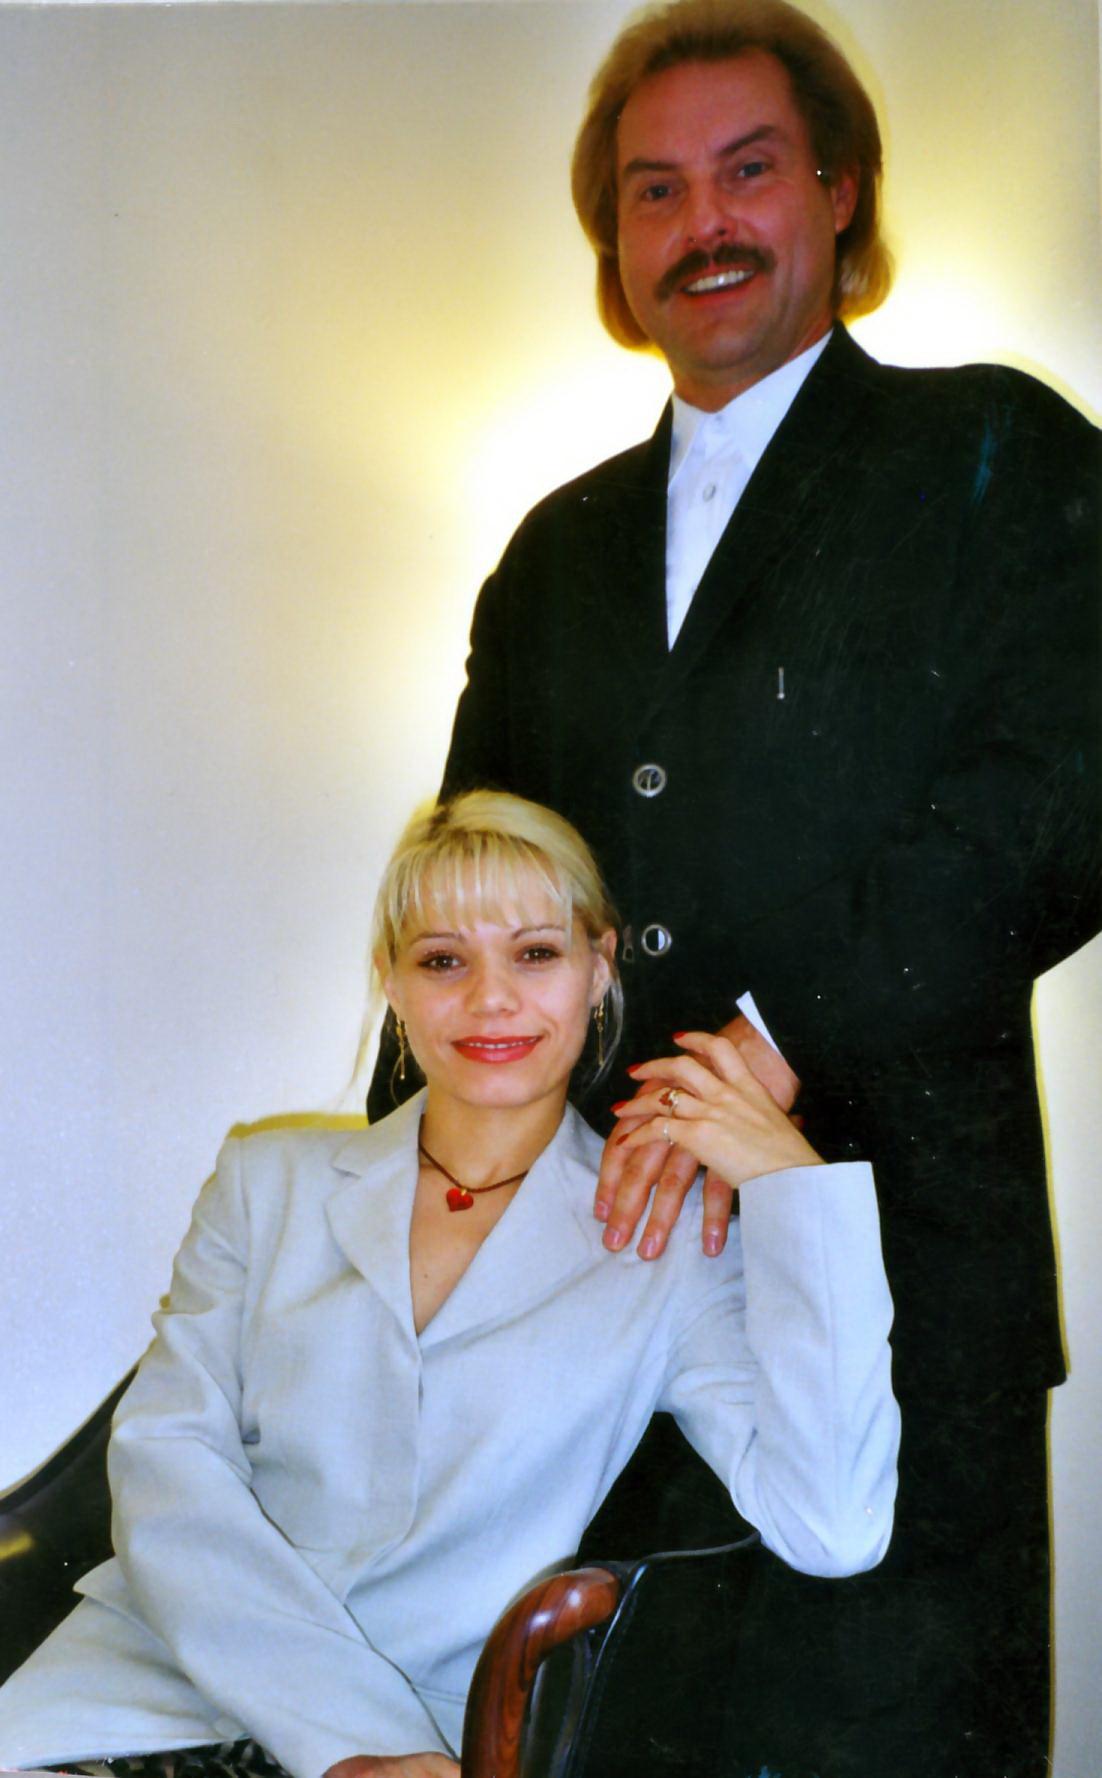 Mariana si Erck au avut o relatie de 15 ani